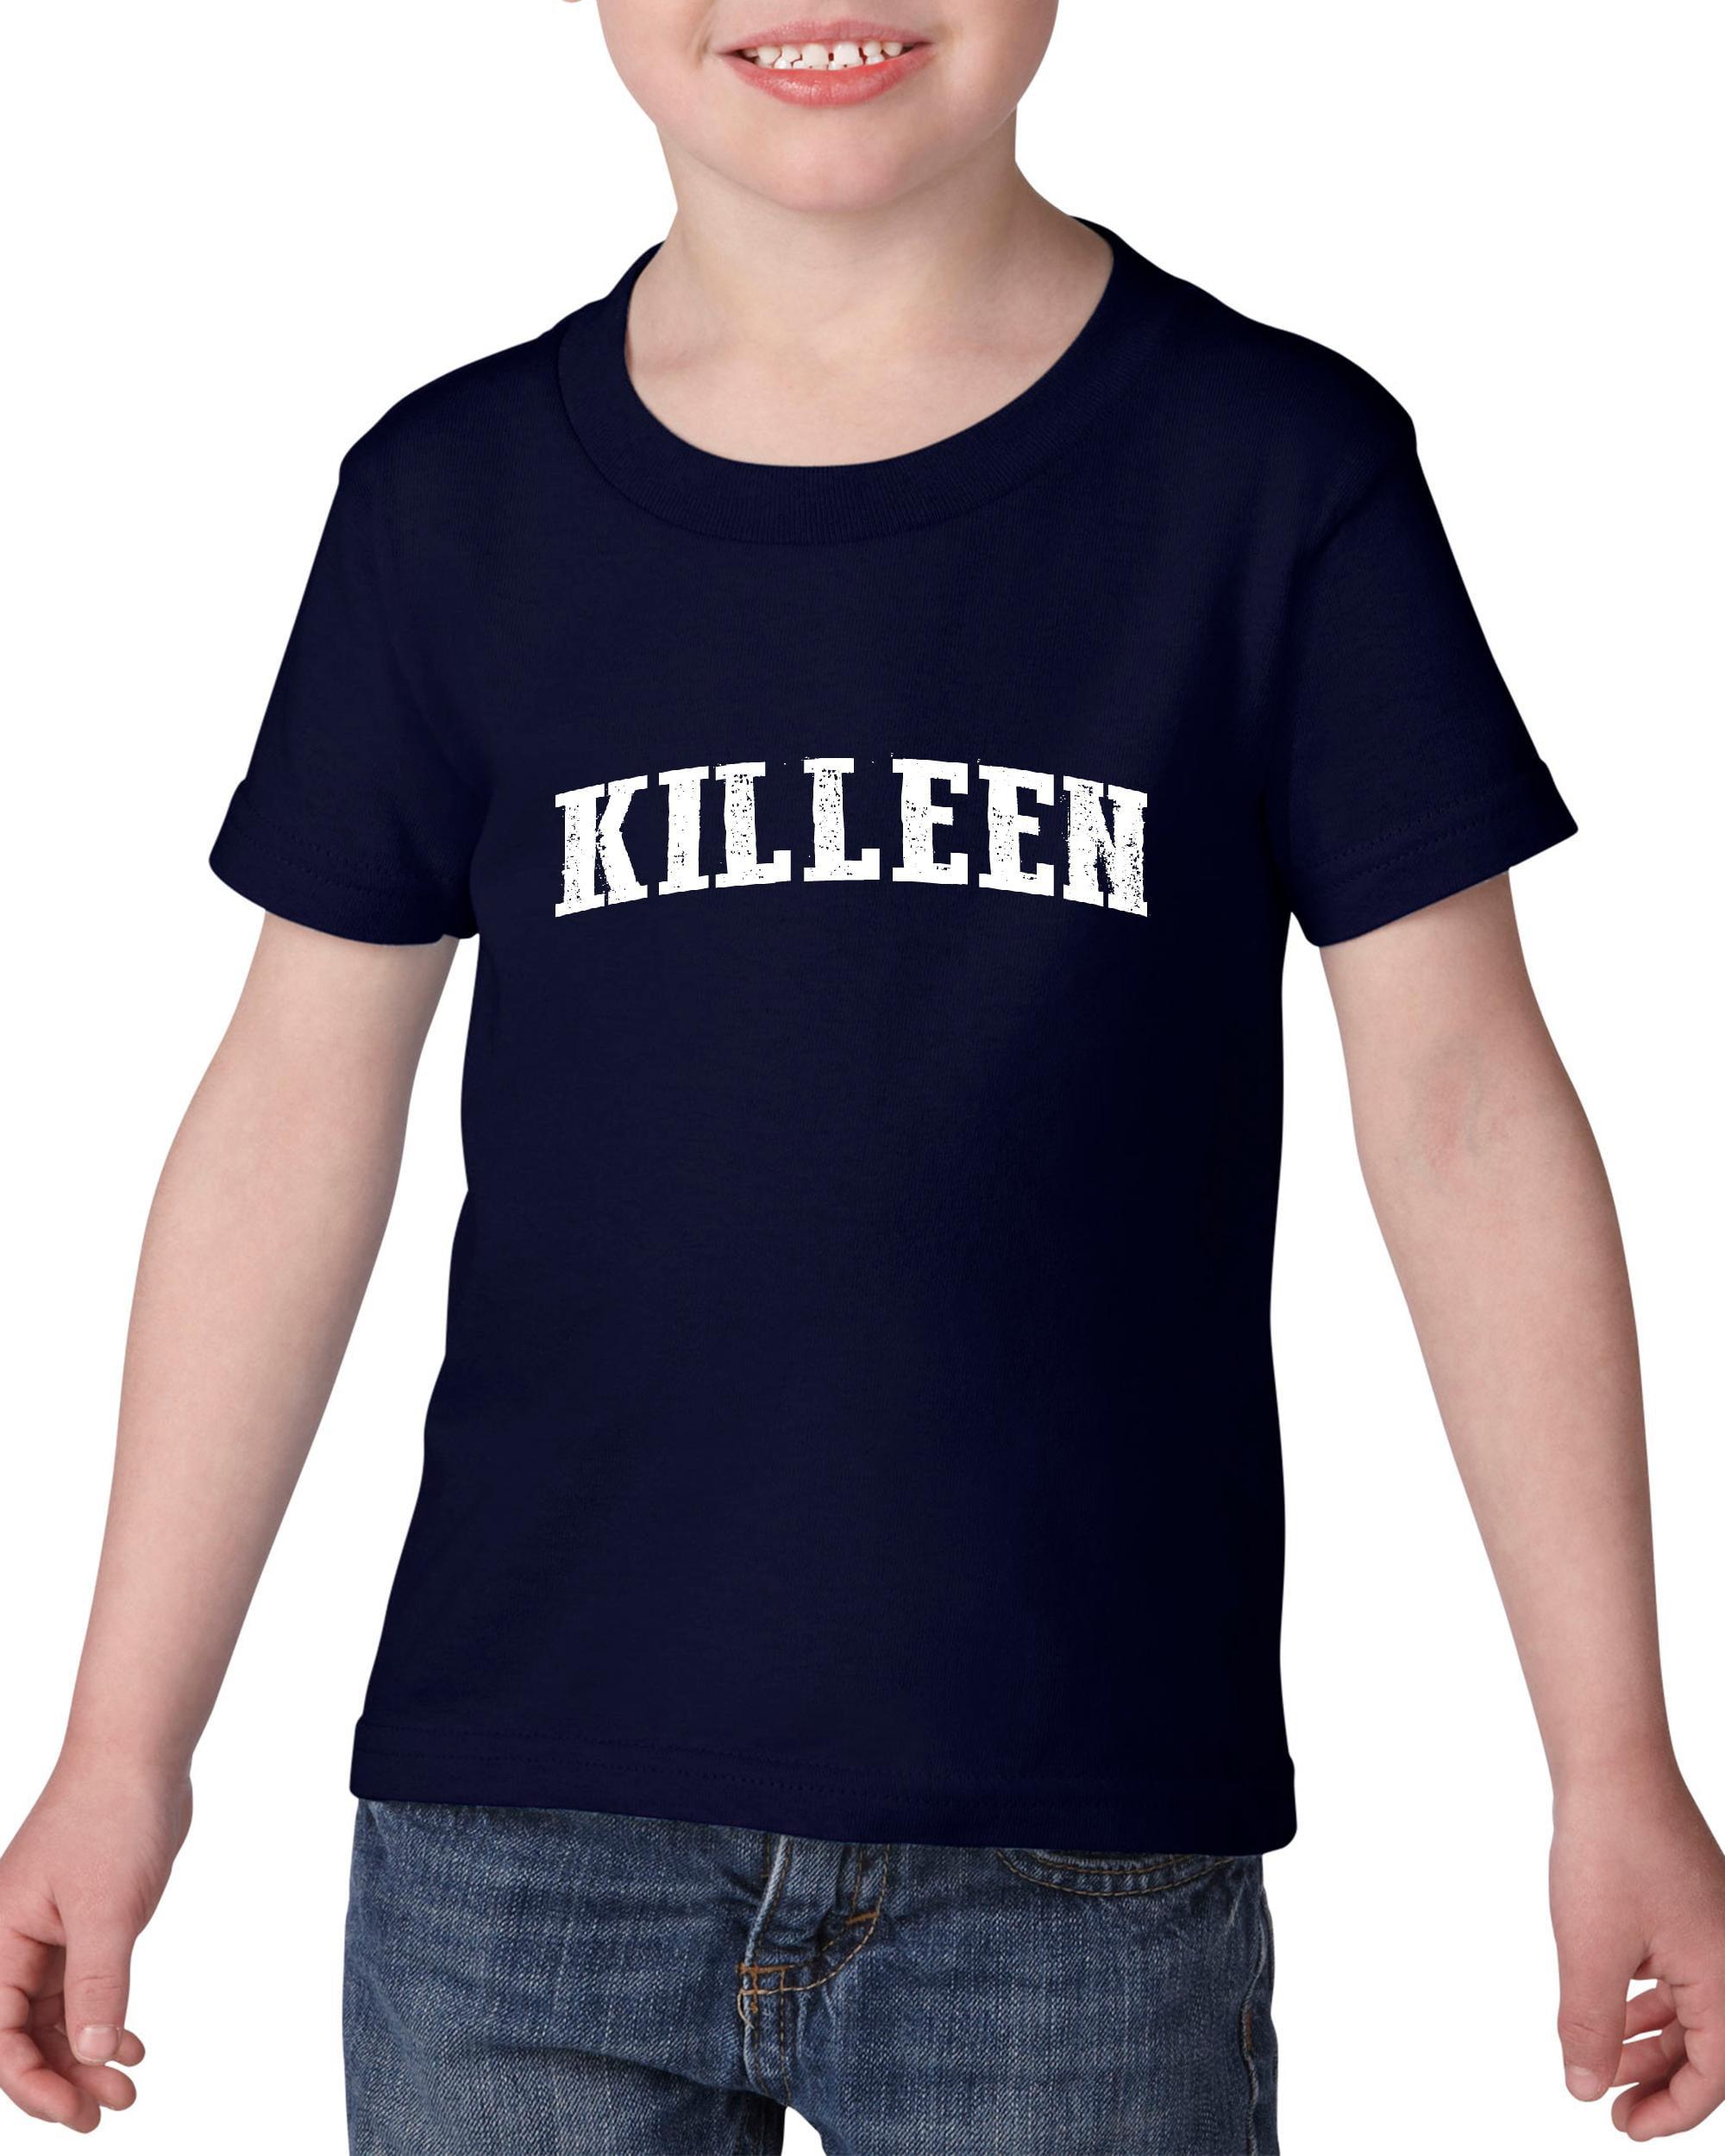 Artix Killeen TX Texas Flag Houston Map Longhorns Bobcats Home Texas State University Heavy Cotton Toddler Kids T-Shirt Tee Clothing